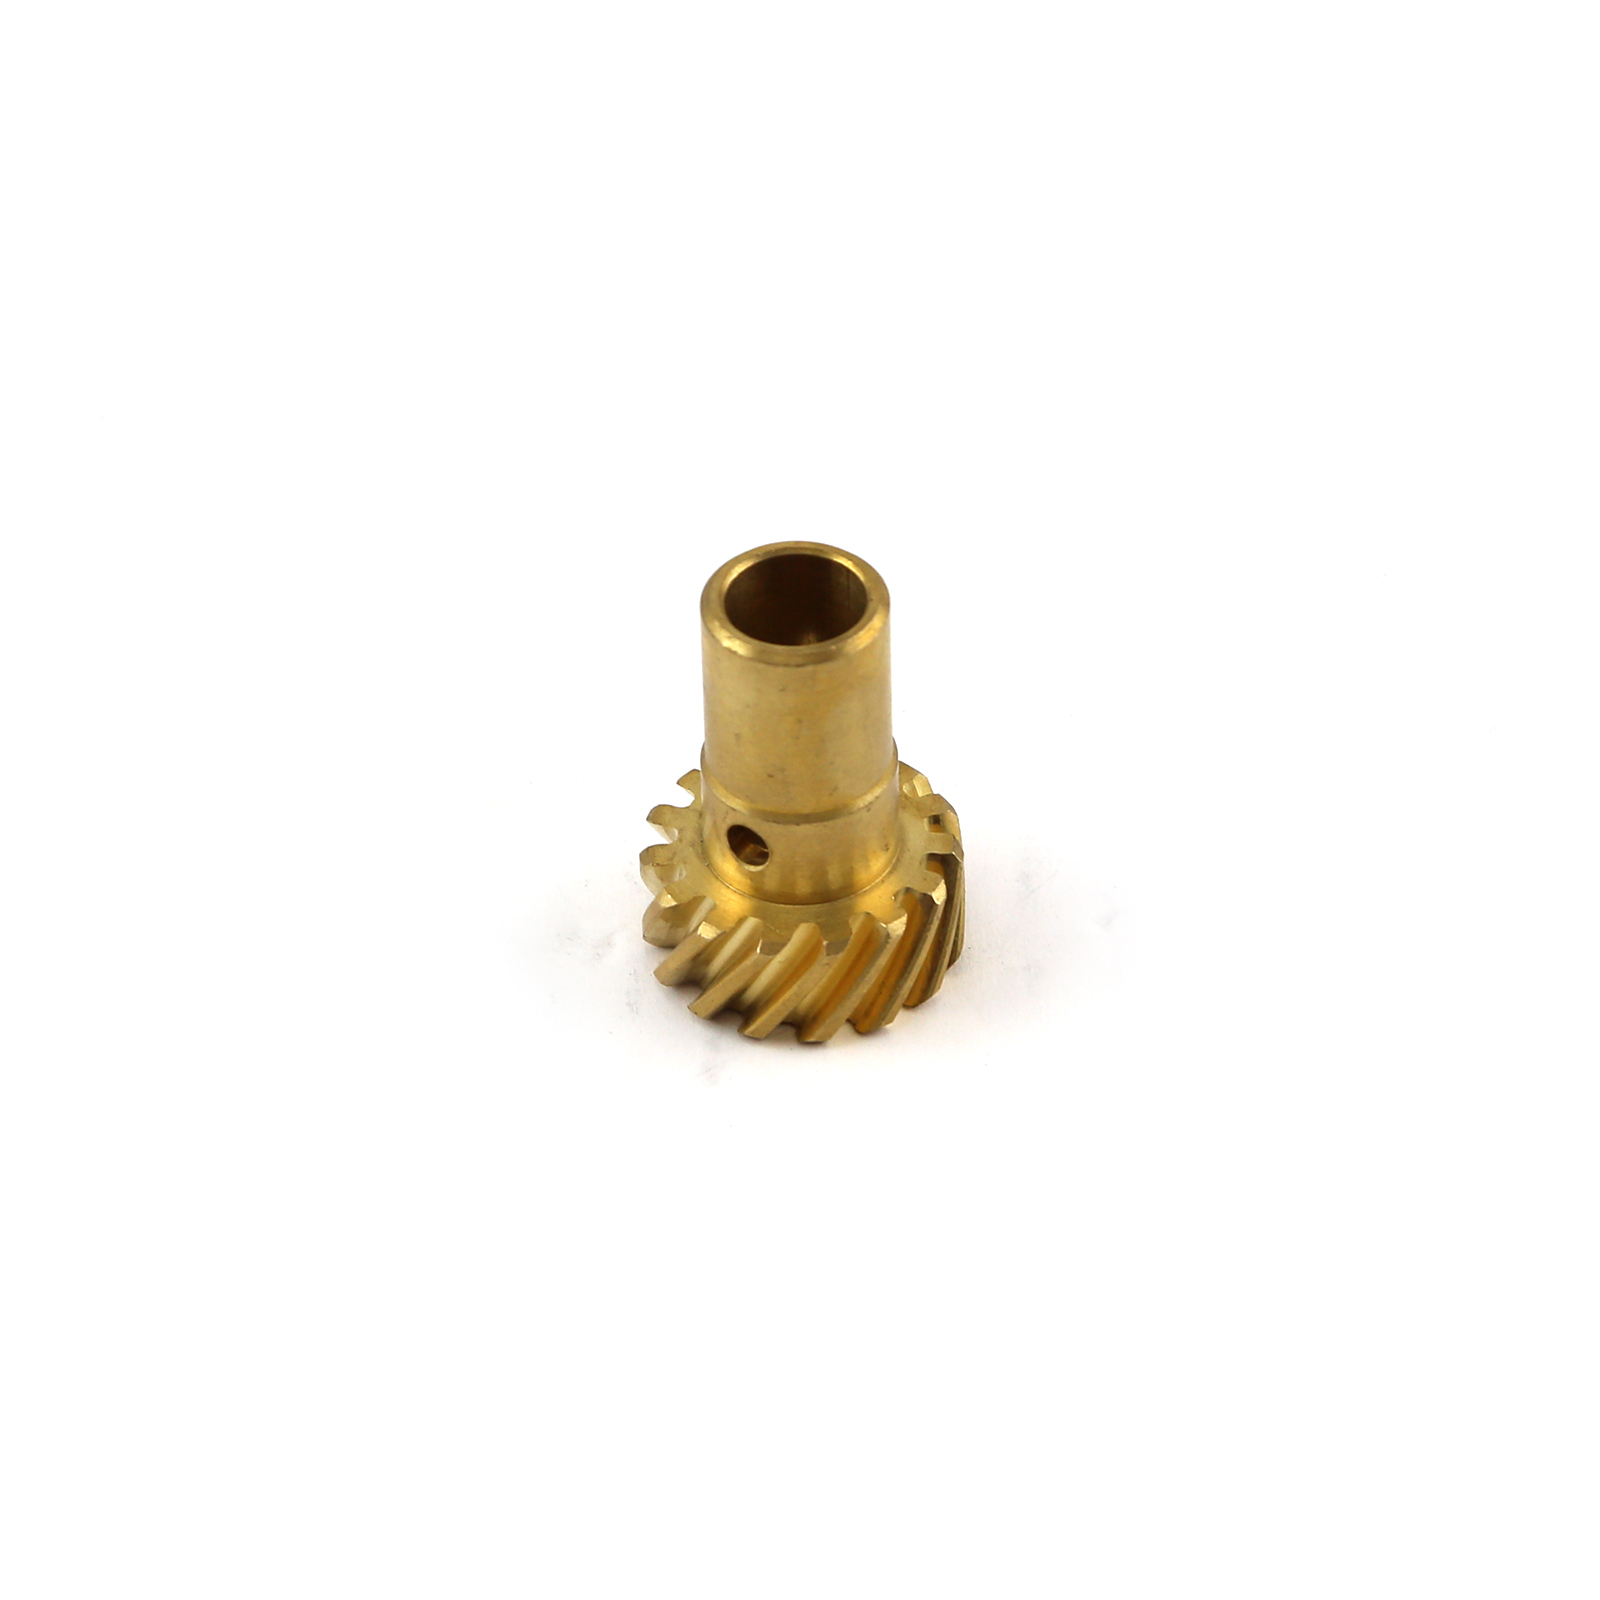 "Ford SB 289 302 351 Windsor Bronze 0.531"" Shaft Distributor Gear"